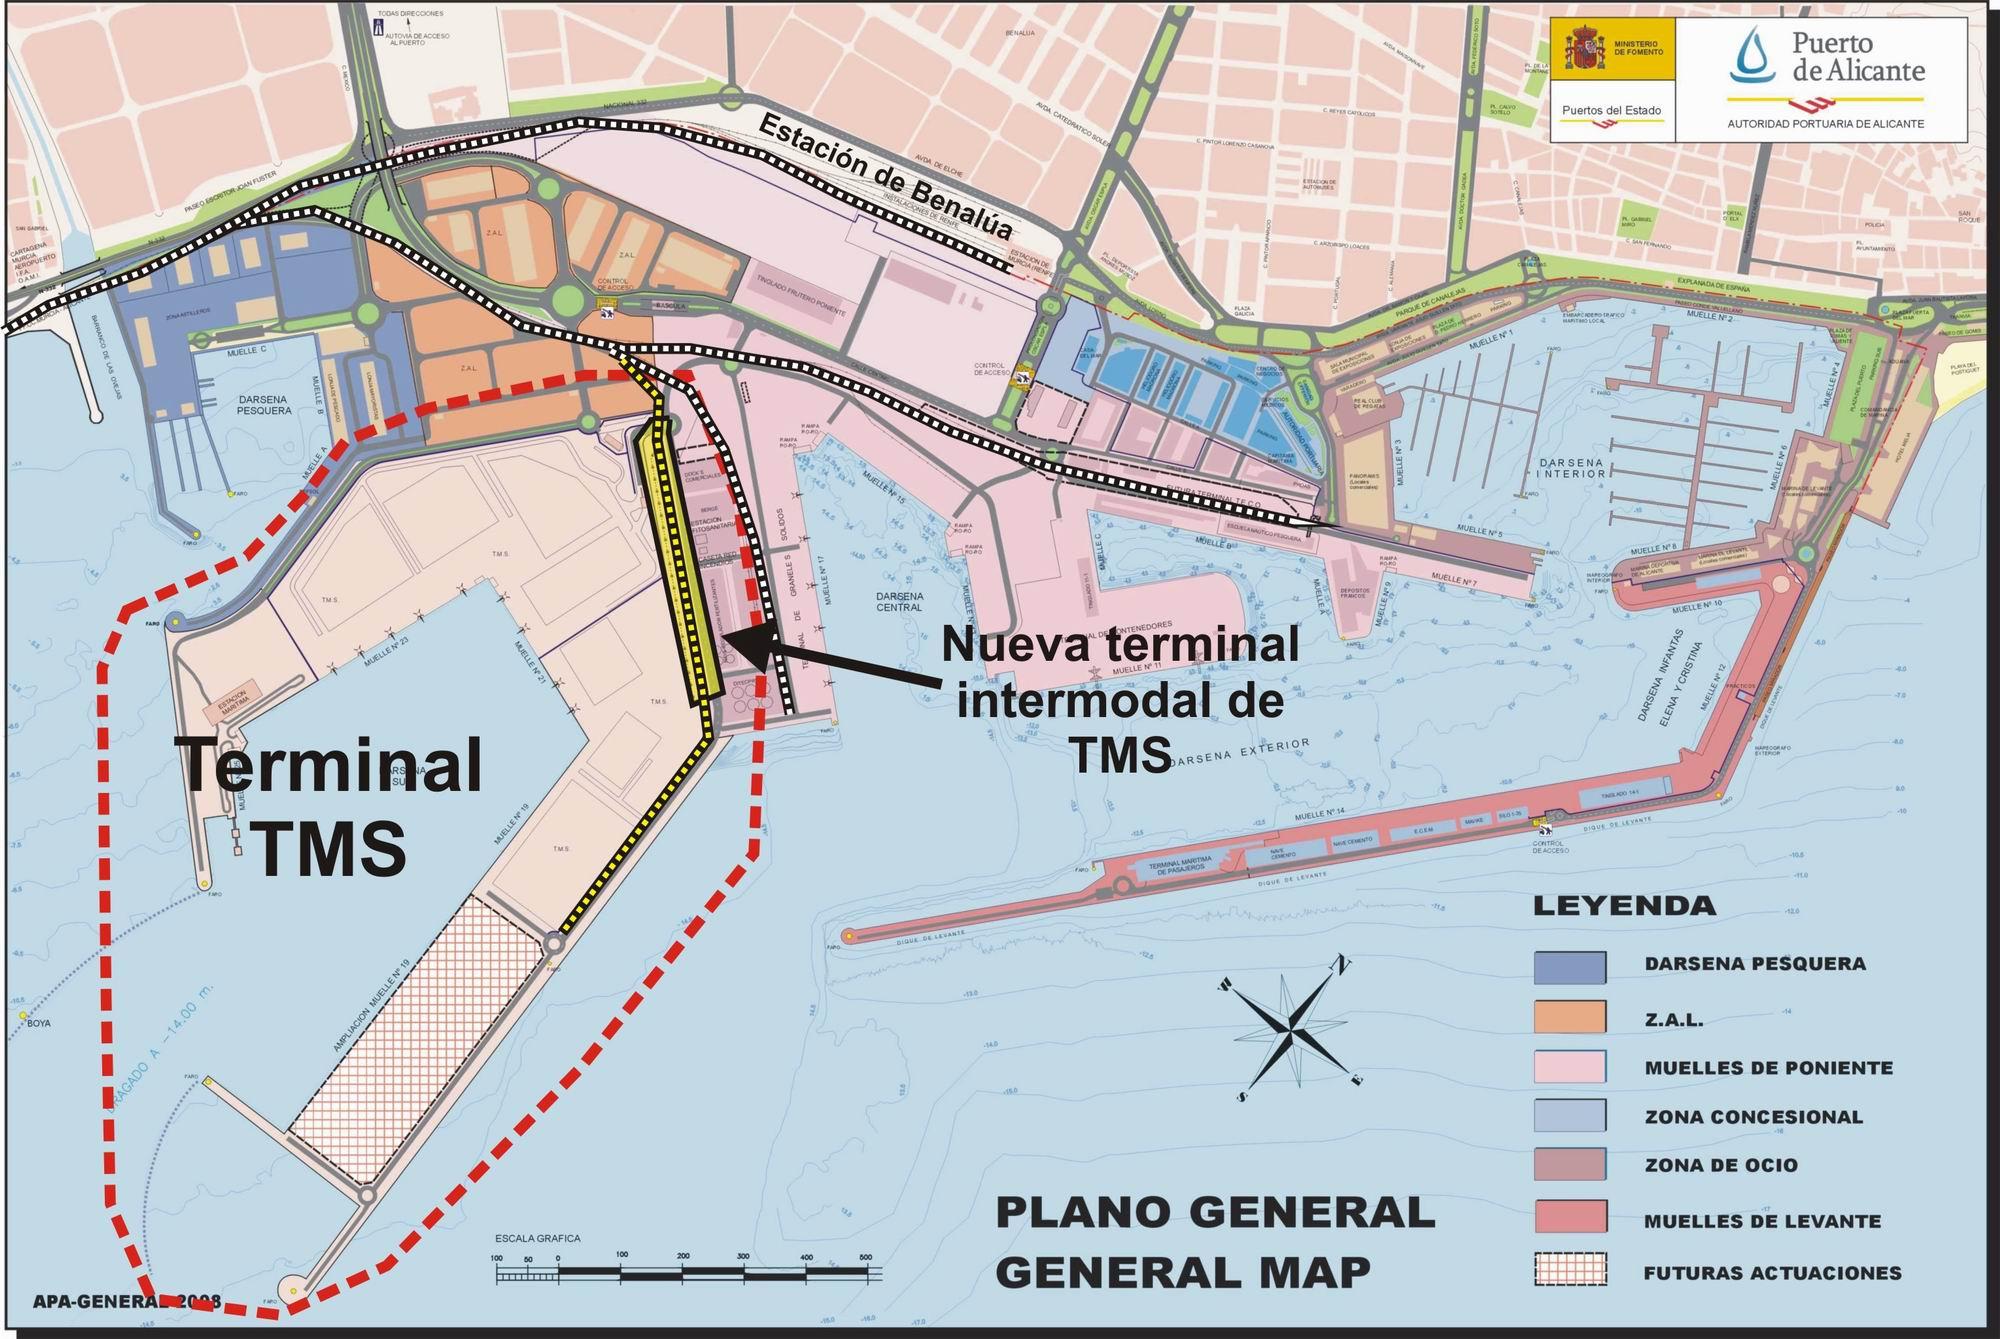 Terminal intermodal TMS del puerto de Alicante 2008